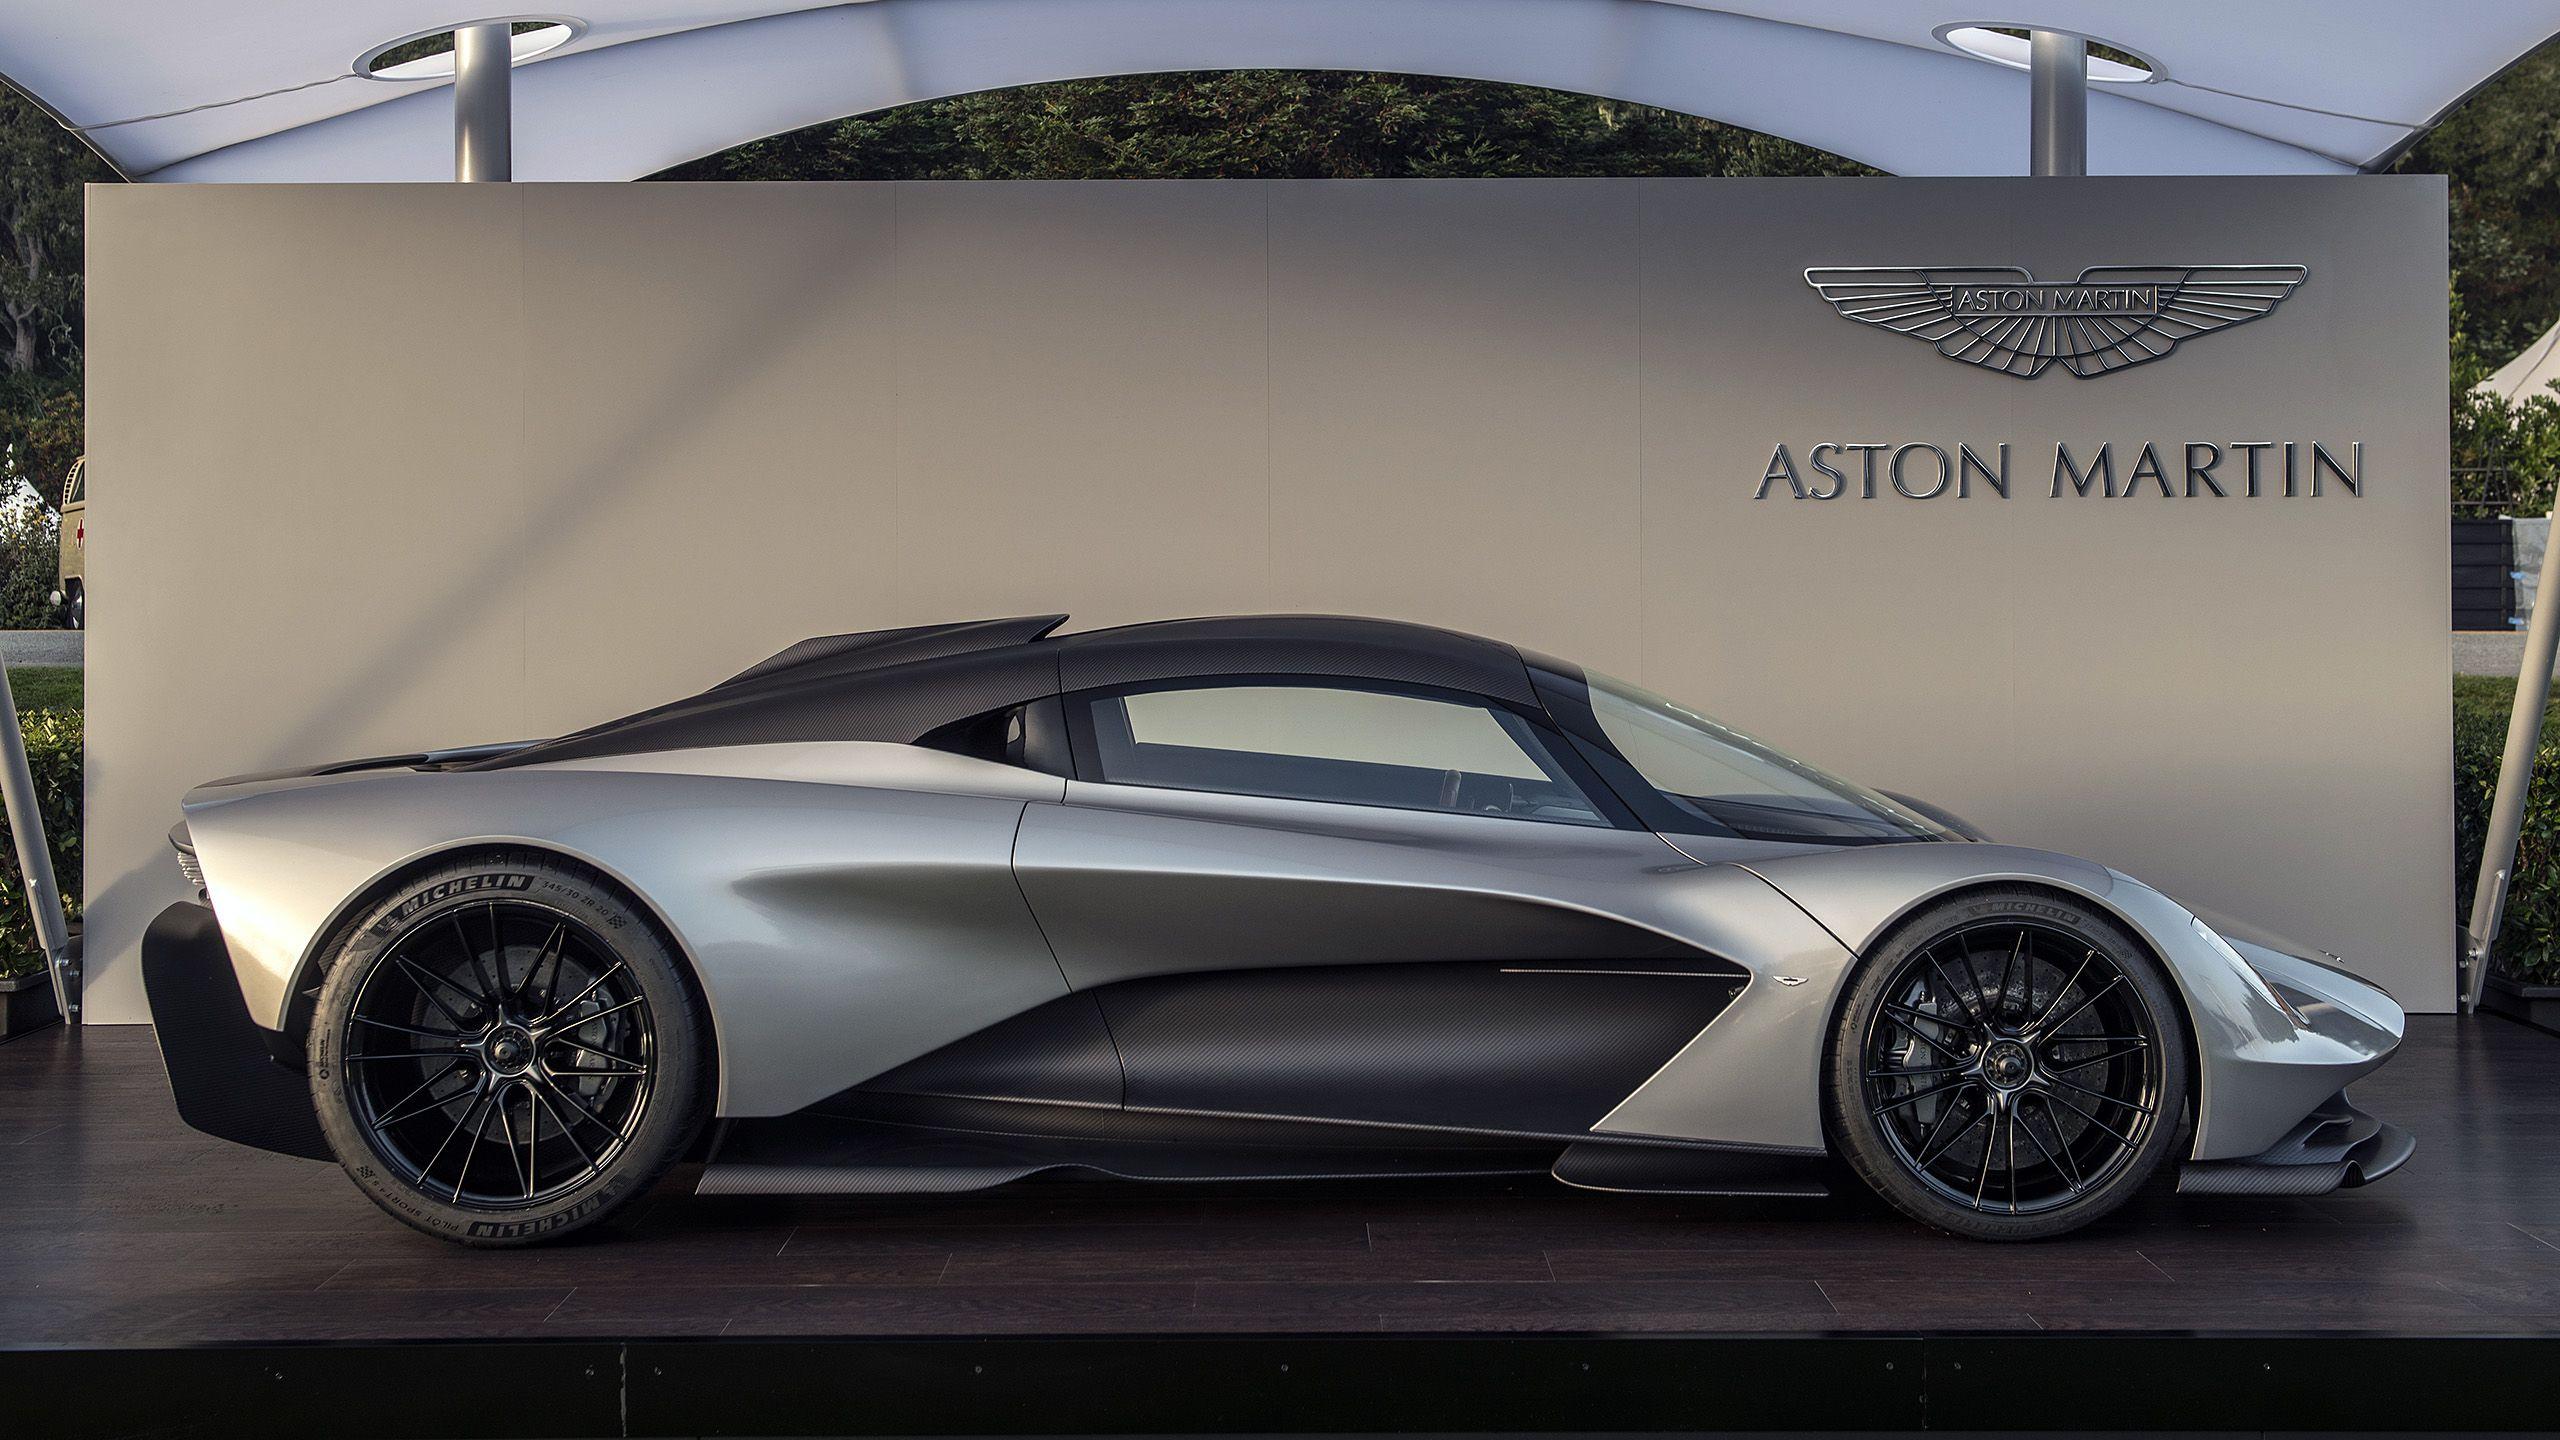 Aston Martin Valhalla at the Quail Photo Gallery